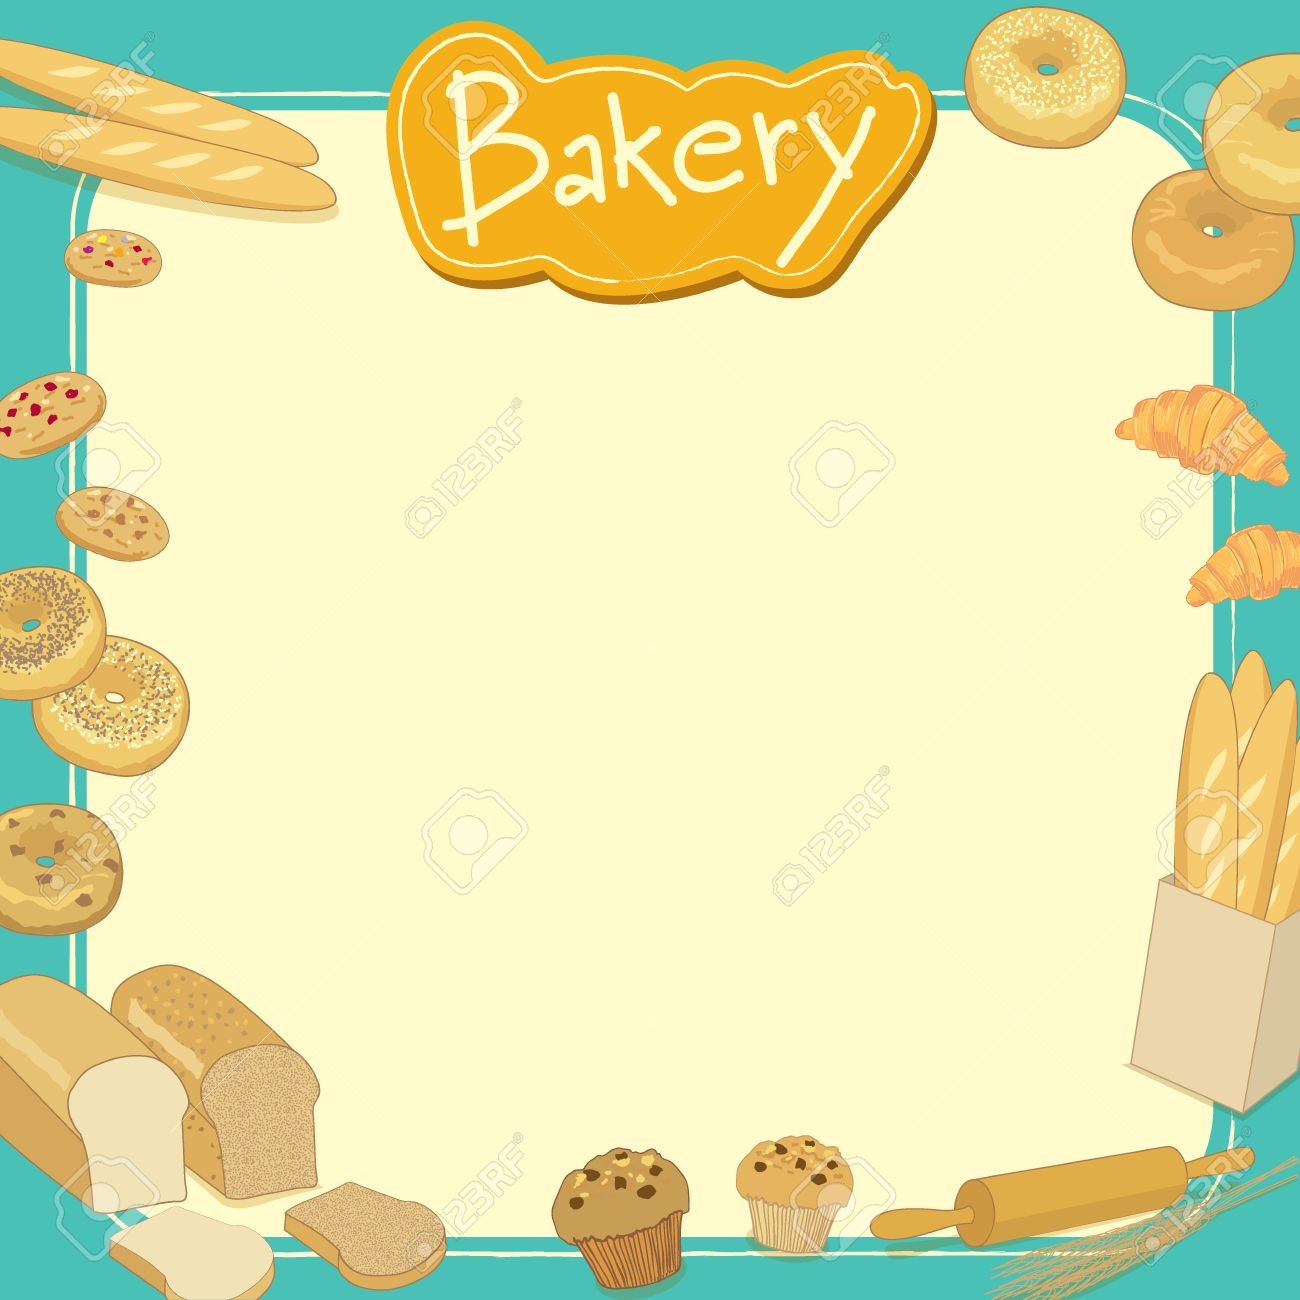 menu template design vector illustration bakery cafe shop empty